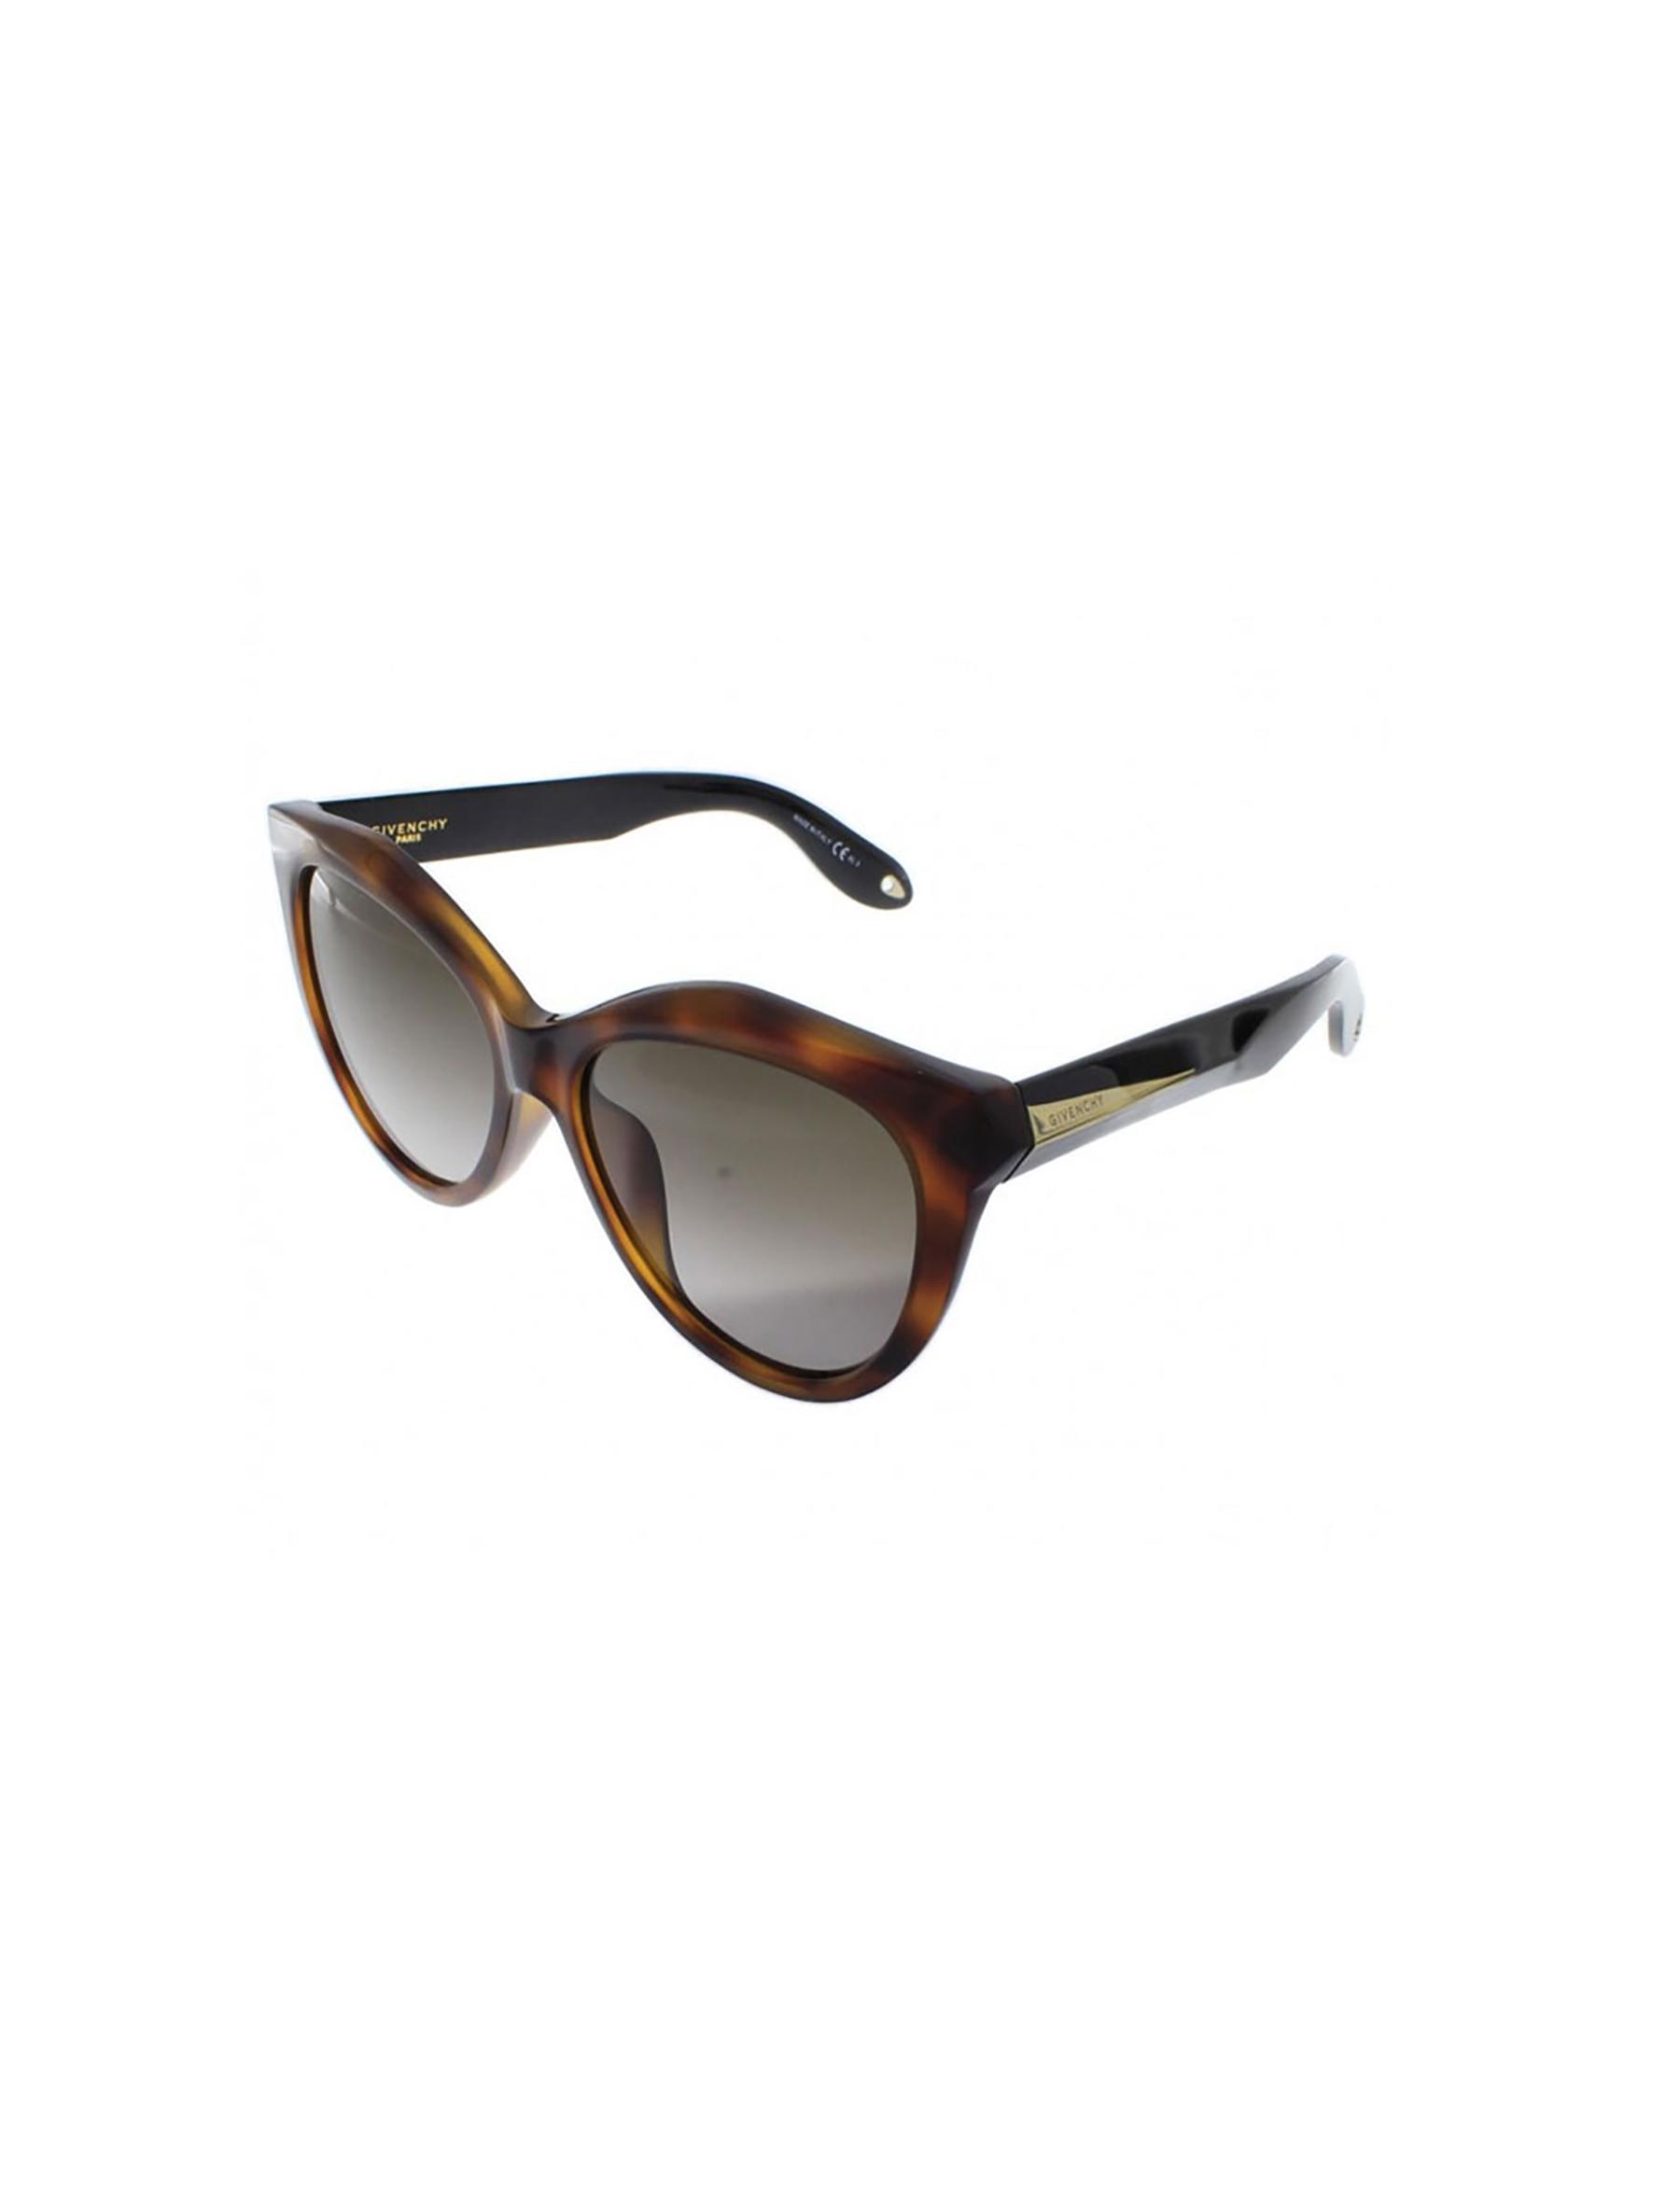 Givenchy Geometric Tortoise Women's Sunglasses